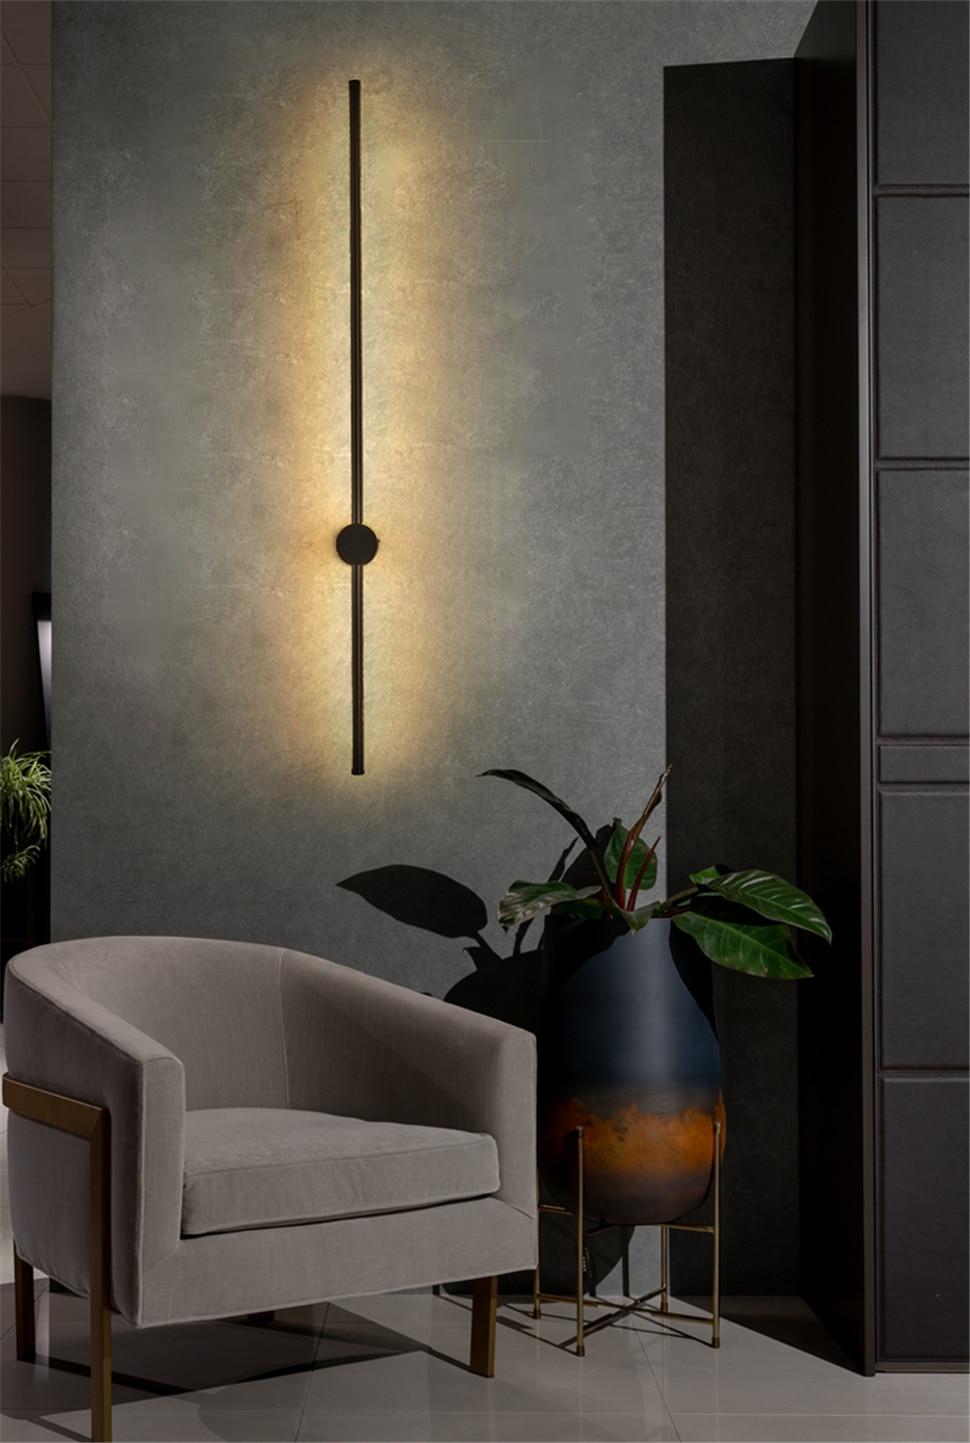 Modern LED Wall Lamp Bedroom Decoration Home Mirror Wall Light Office Hotel Living Room Dining Room Indoor Lighting wall lights